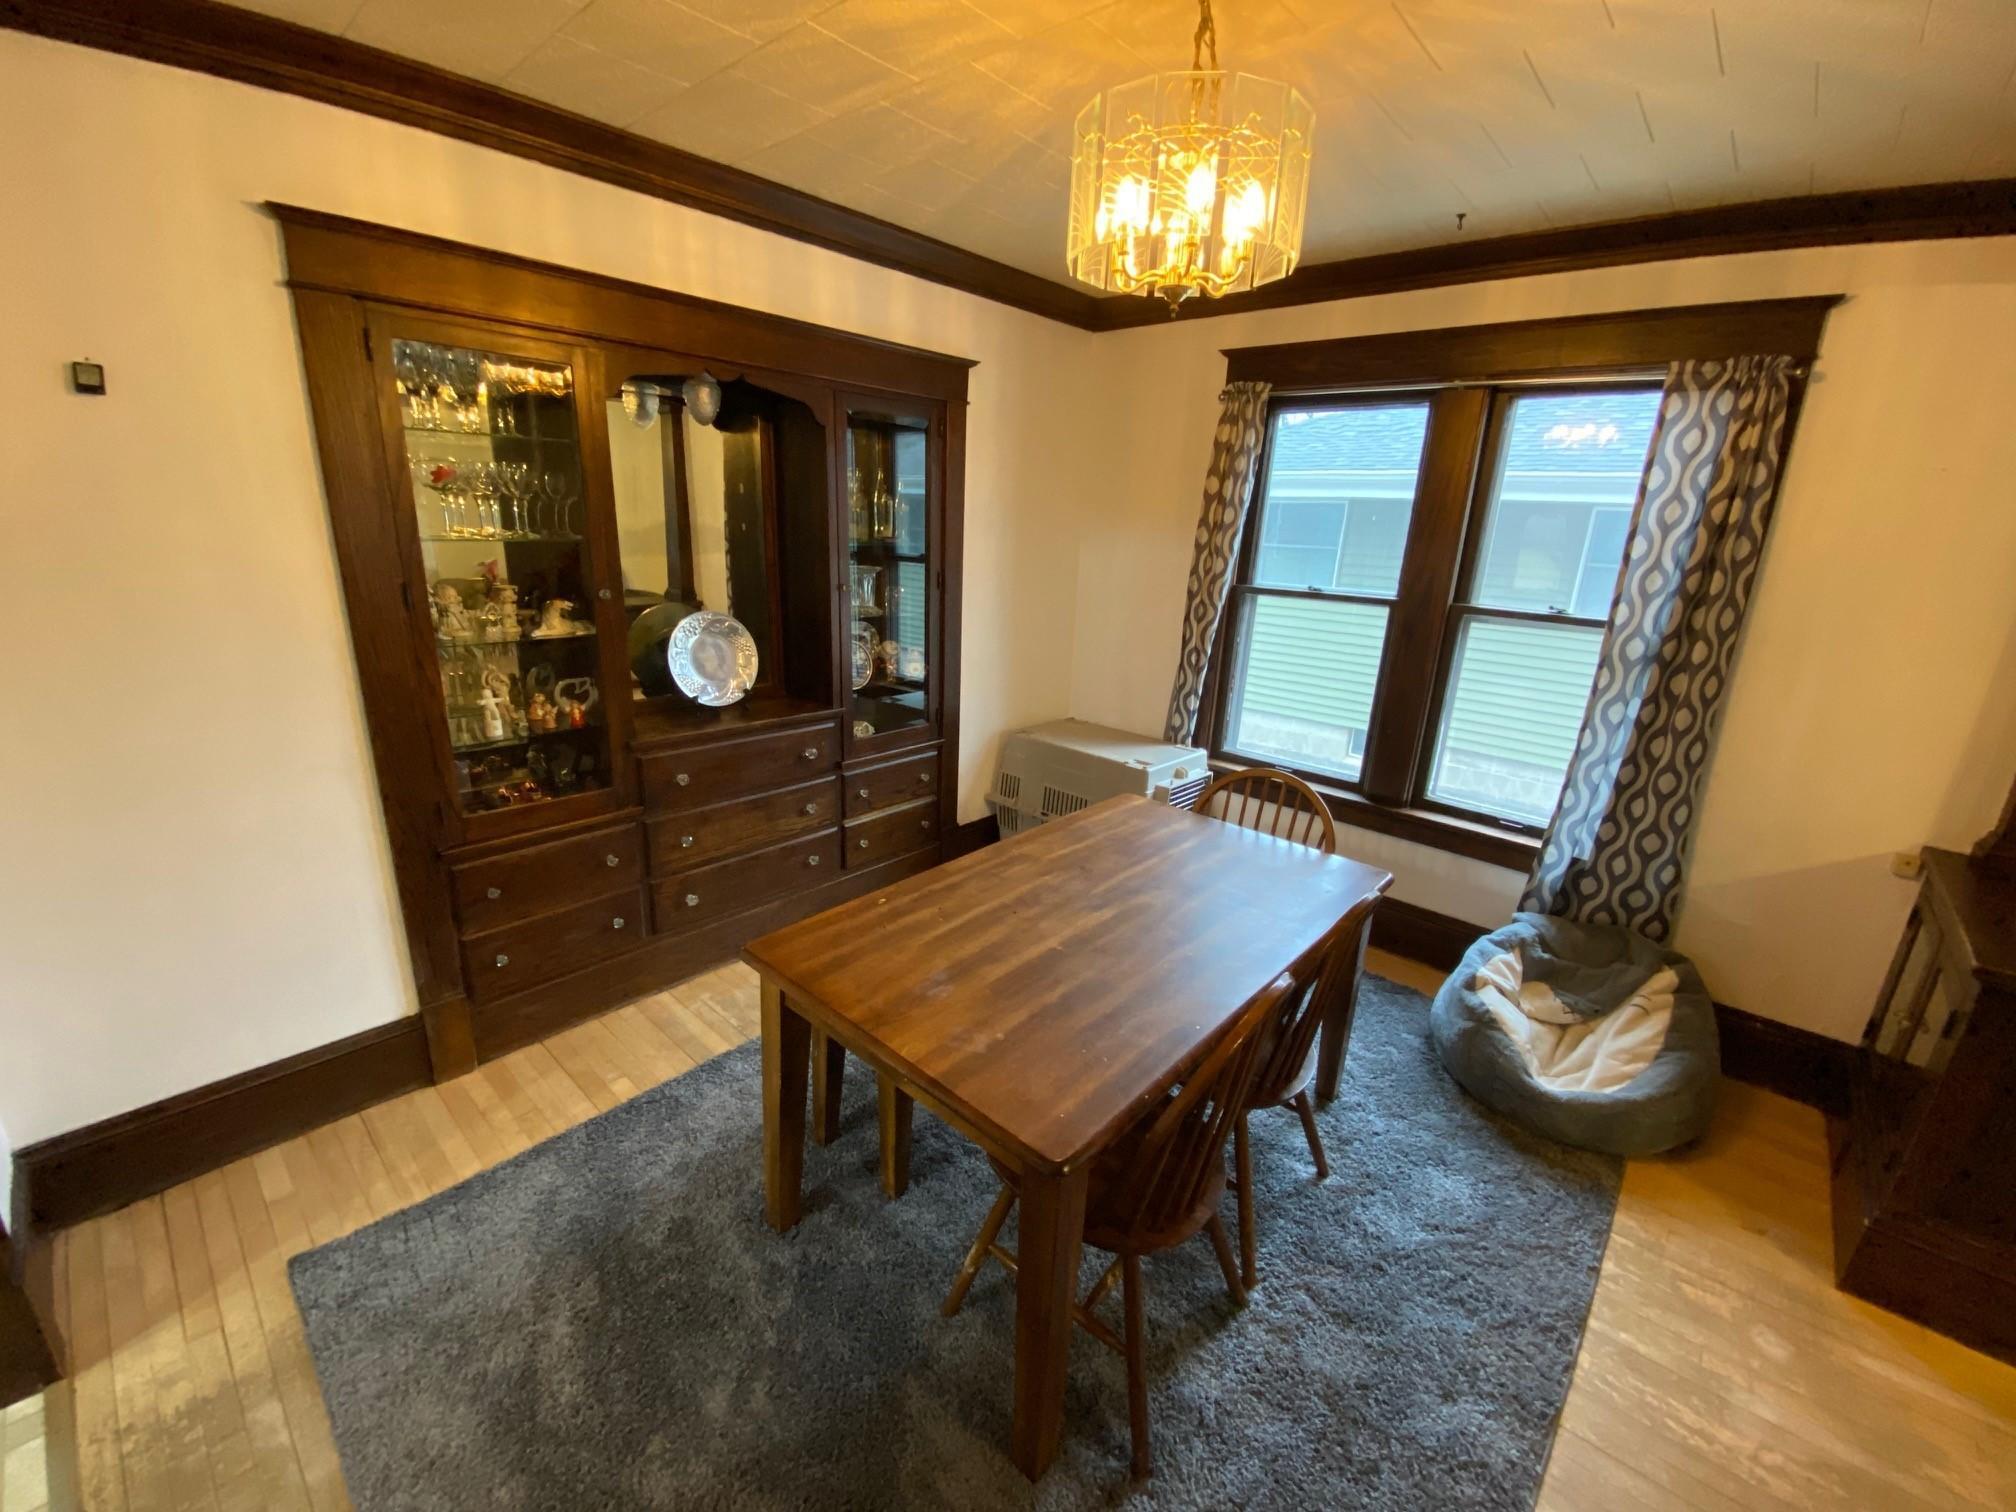 Built-In Buffet Dining Room